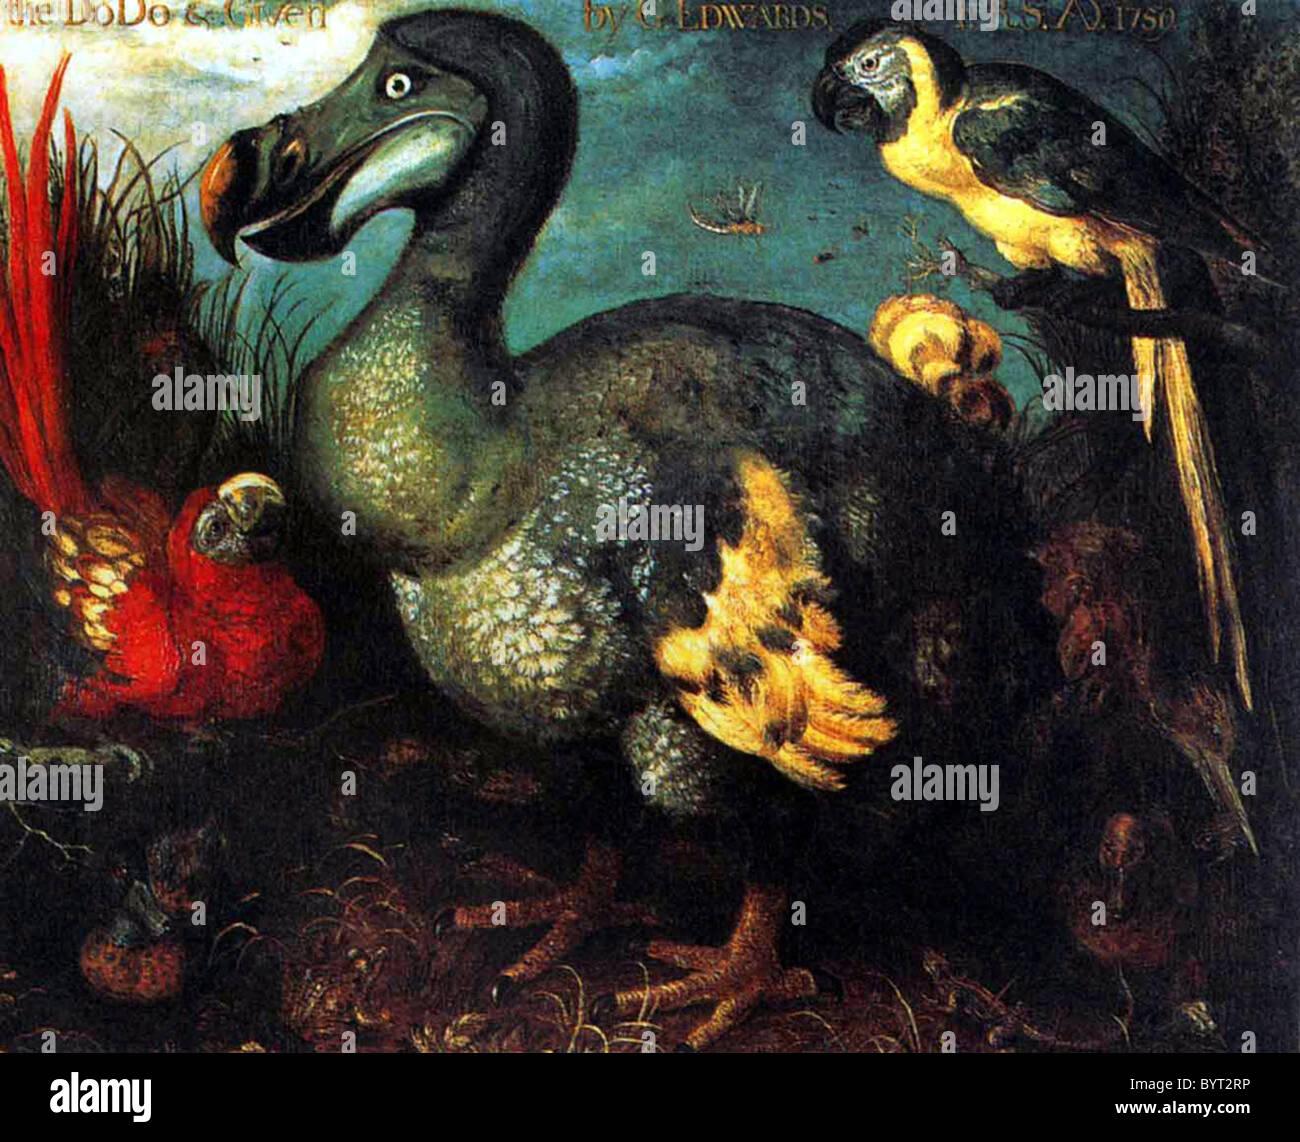 Dodo Imagen De Stock